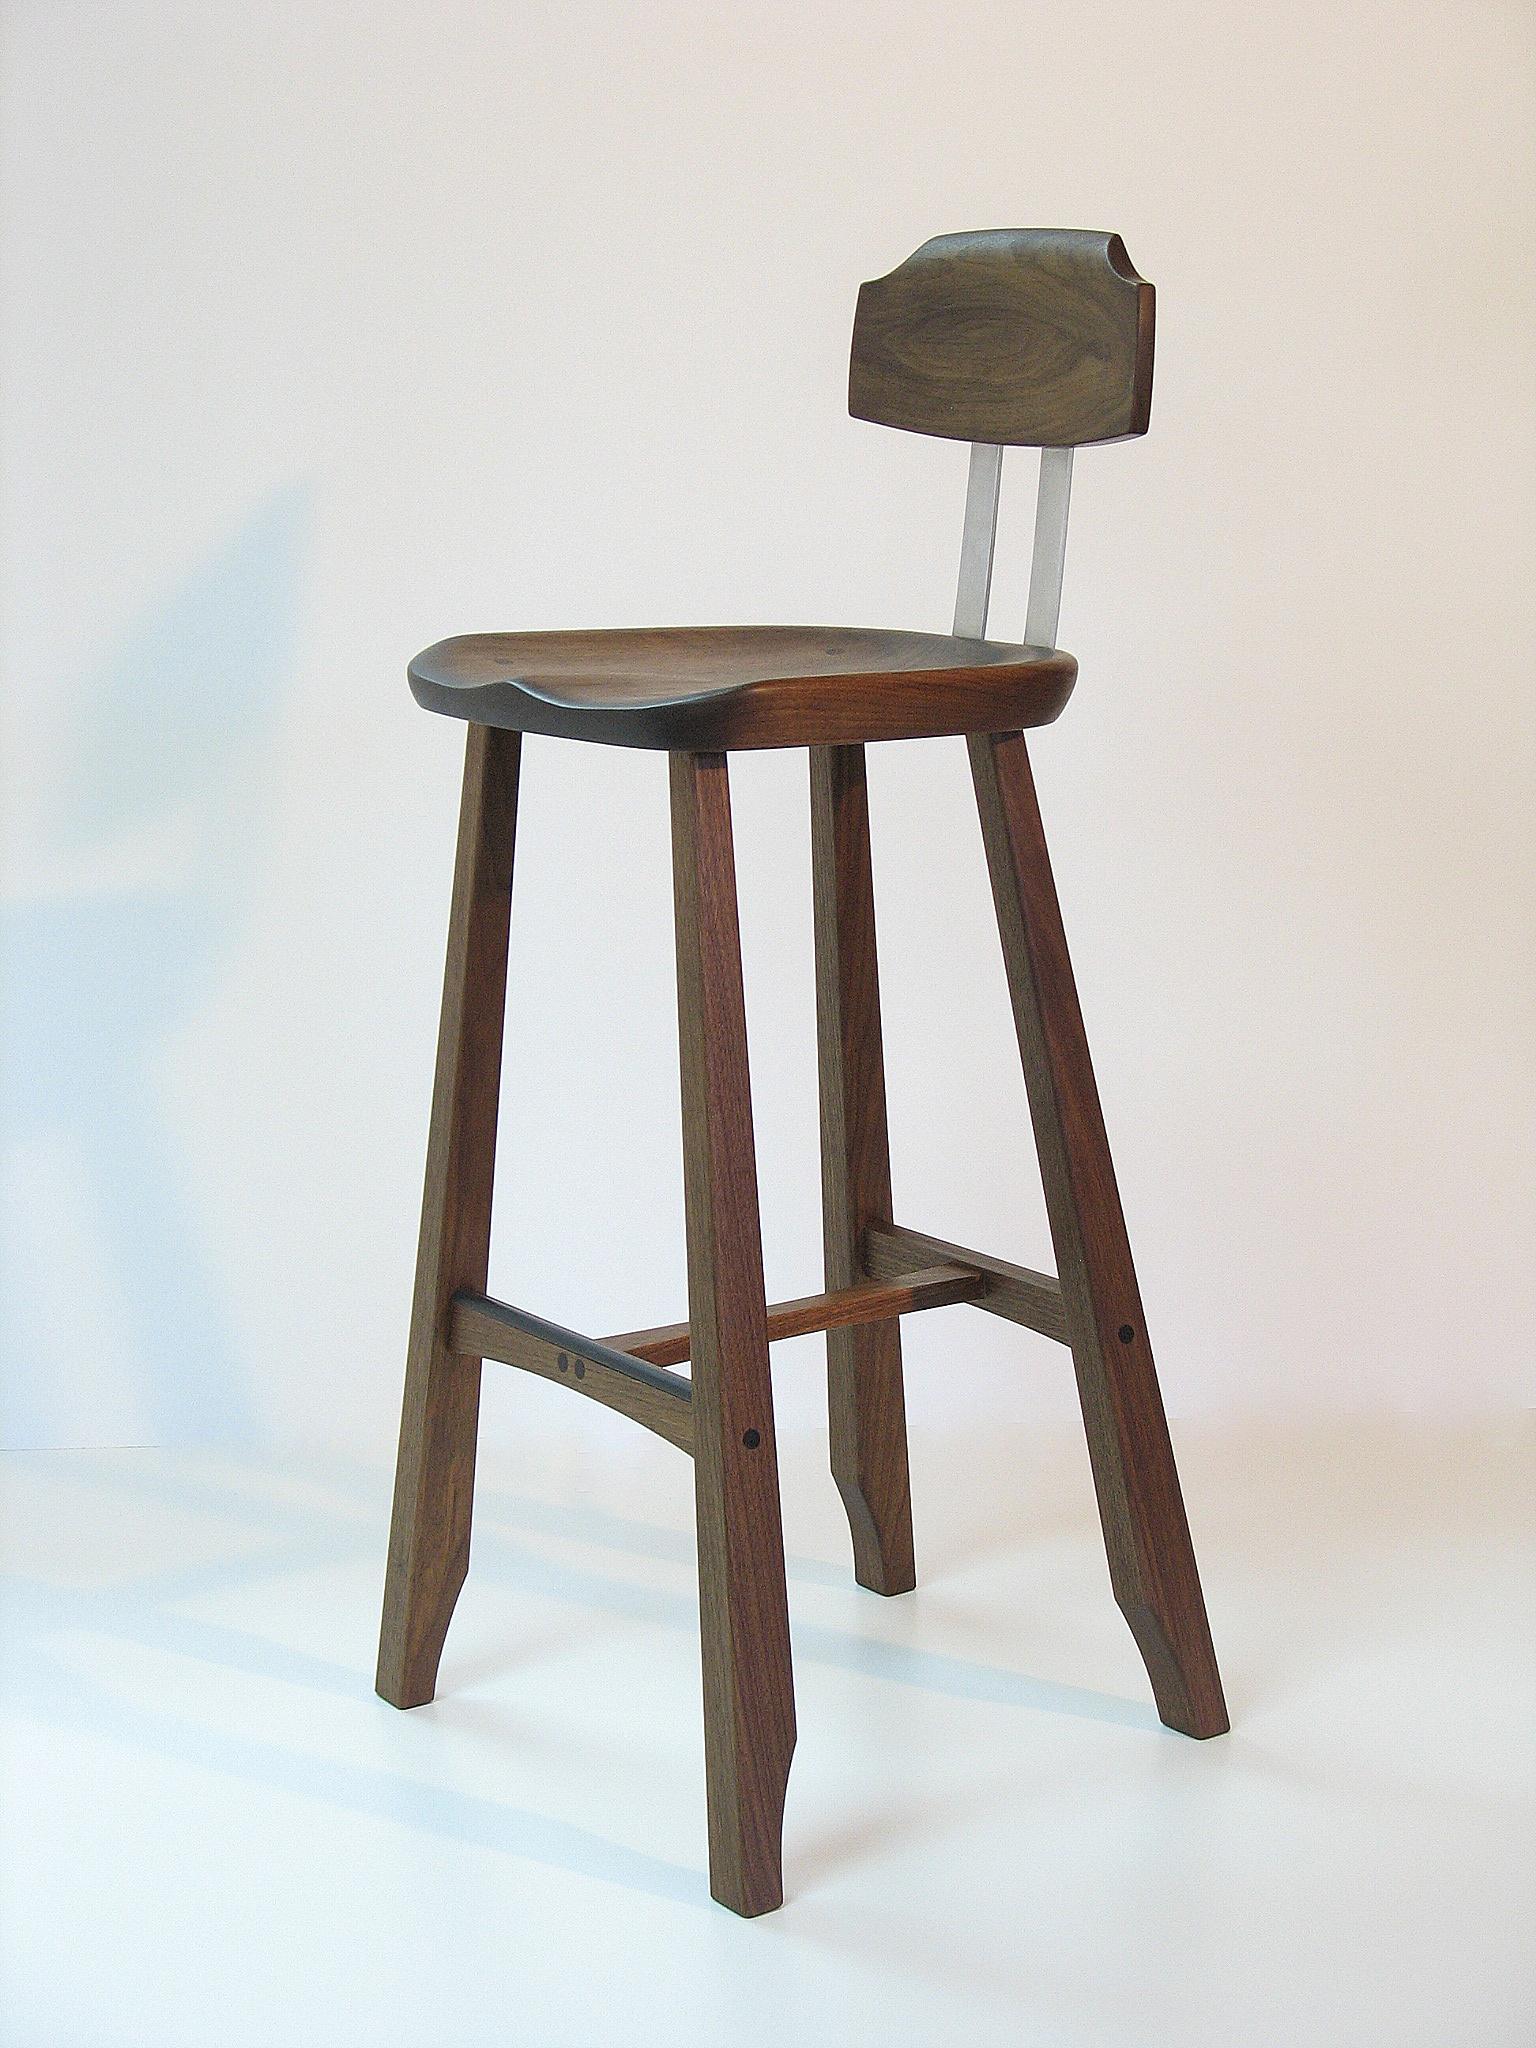 Sculpted Seat Bar Stool